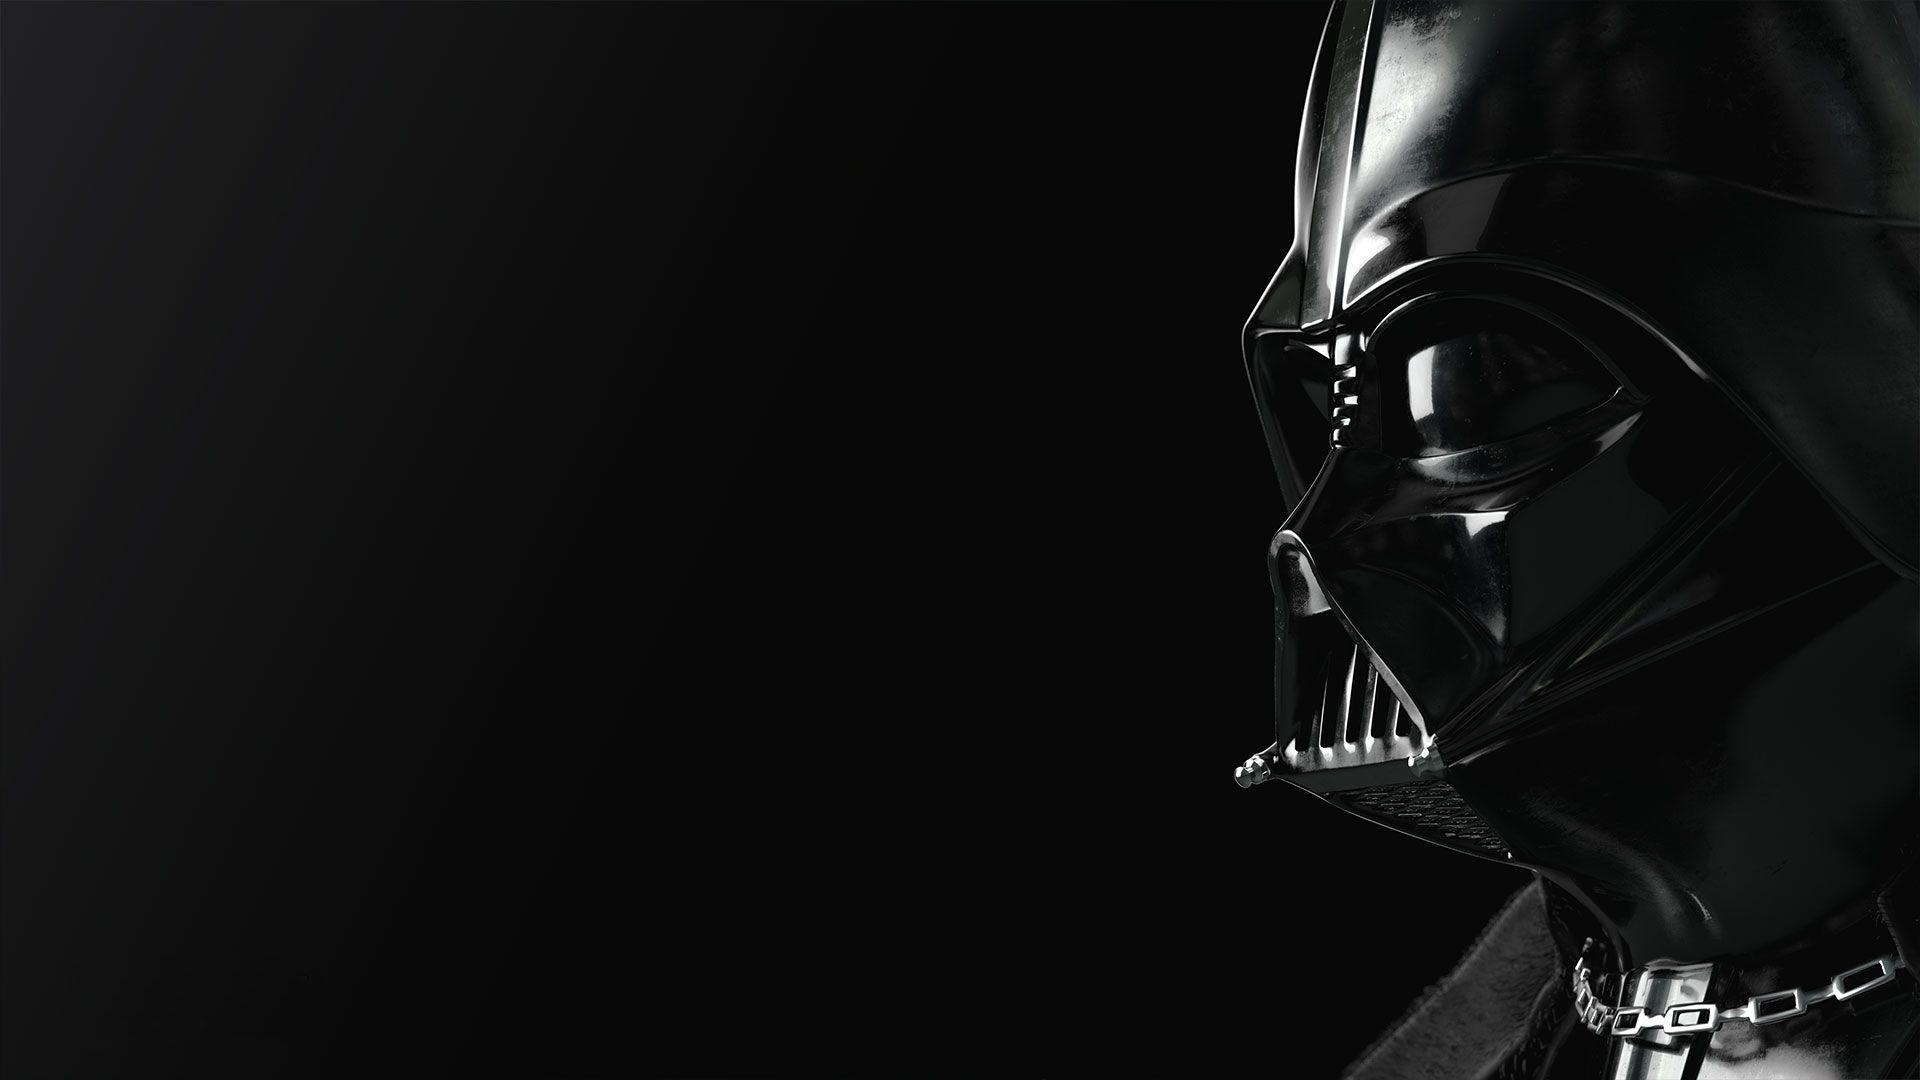 Imgur Star Wars Wallpaper Darth Vader Wallpaper Star Wars Battlefront